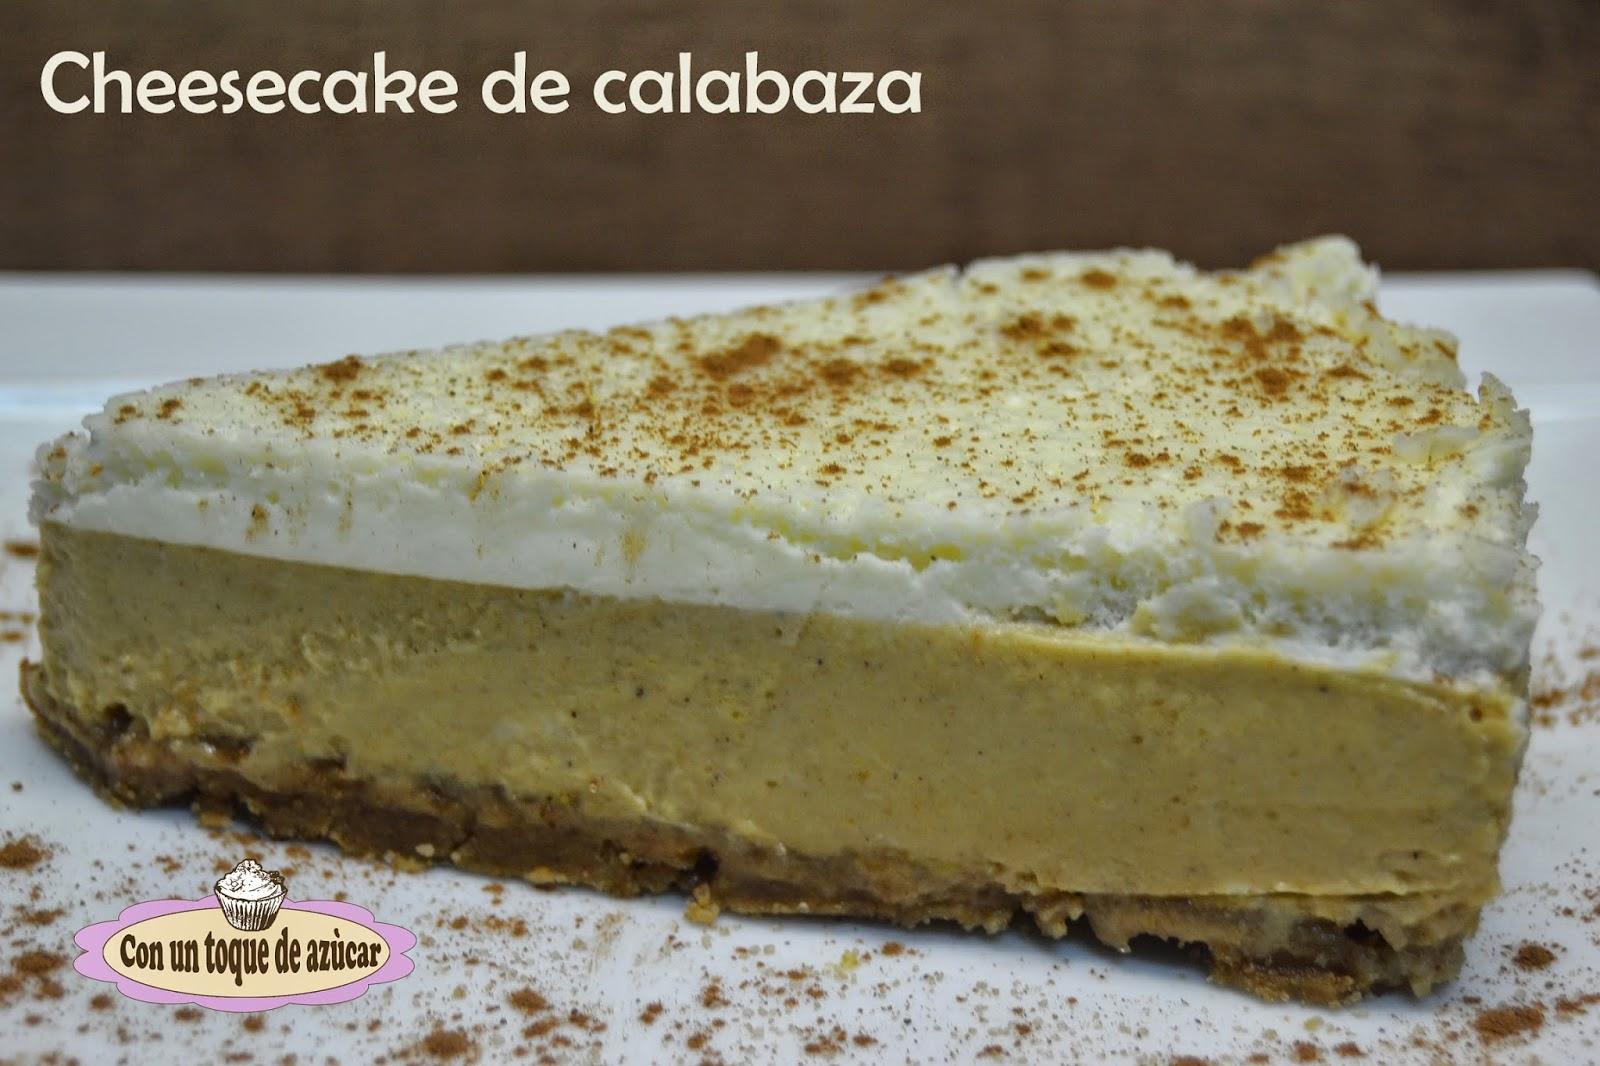 Cheesecake de calabaza II - Con un toque de azúcar